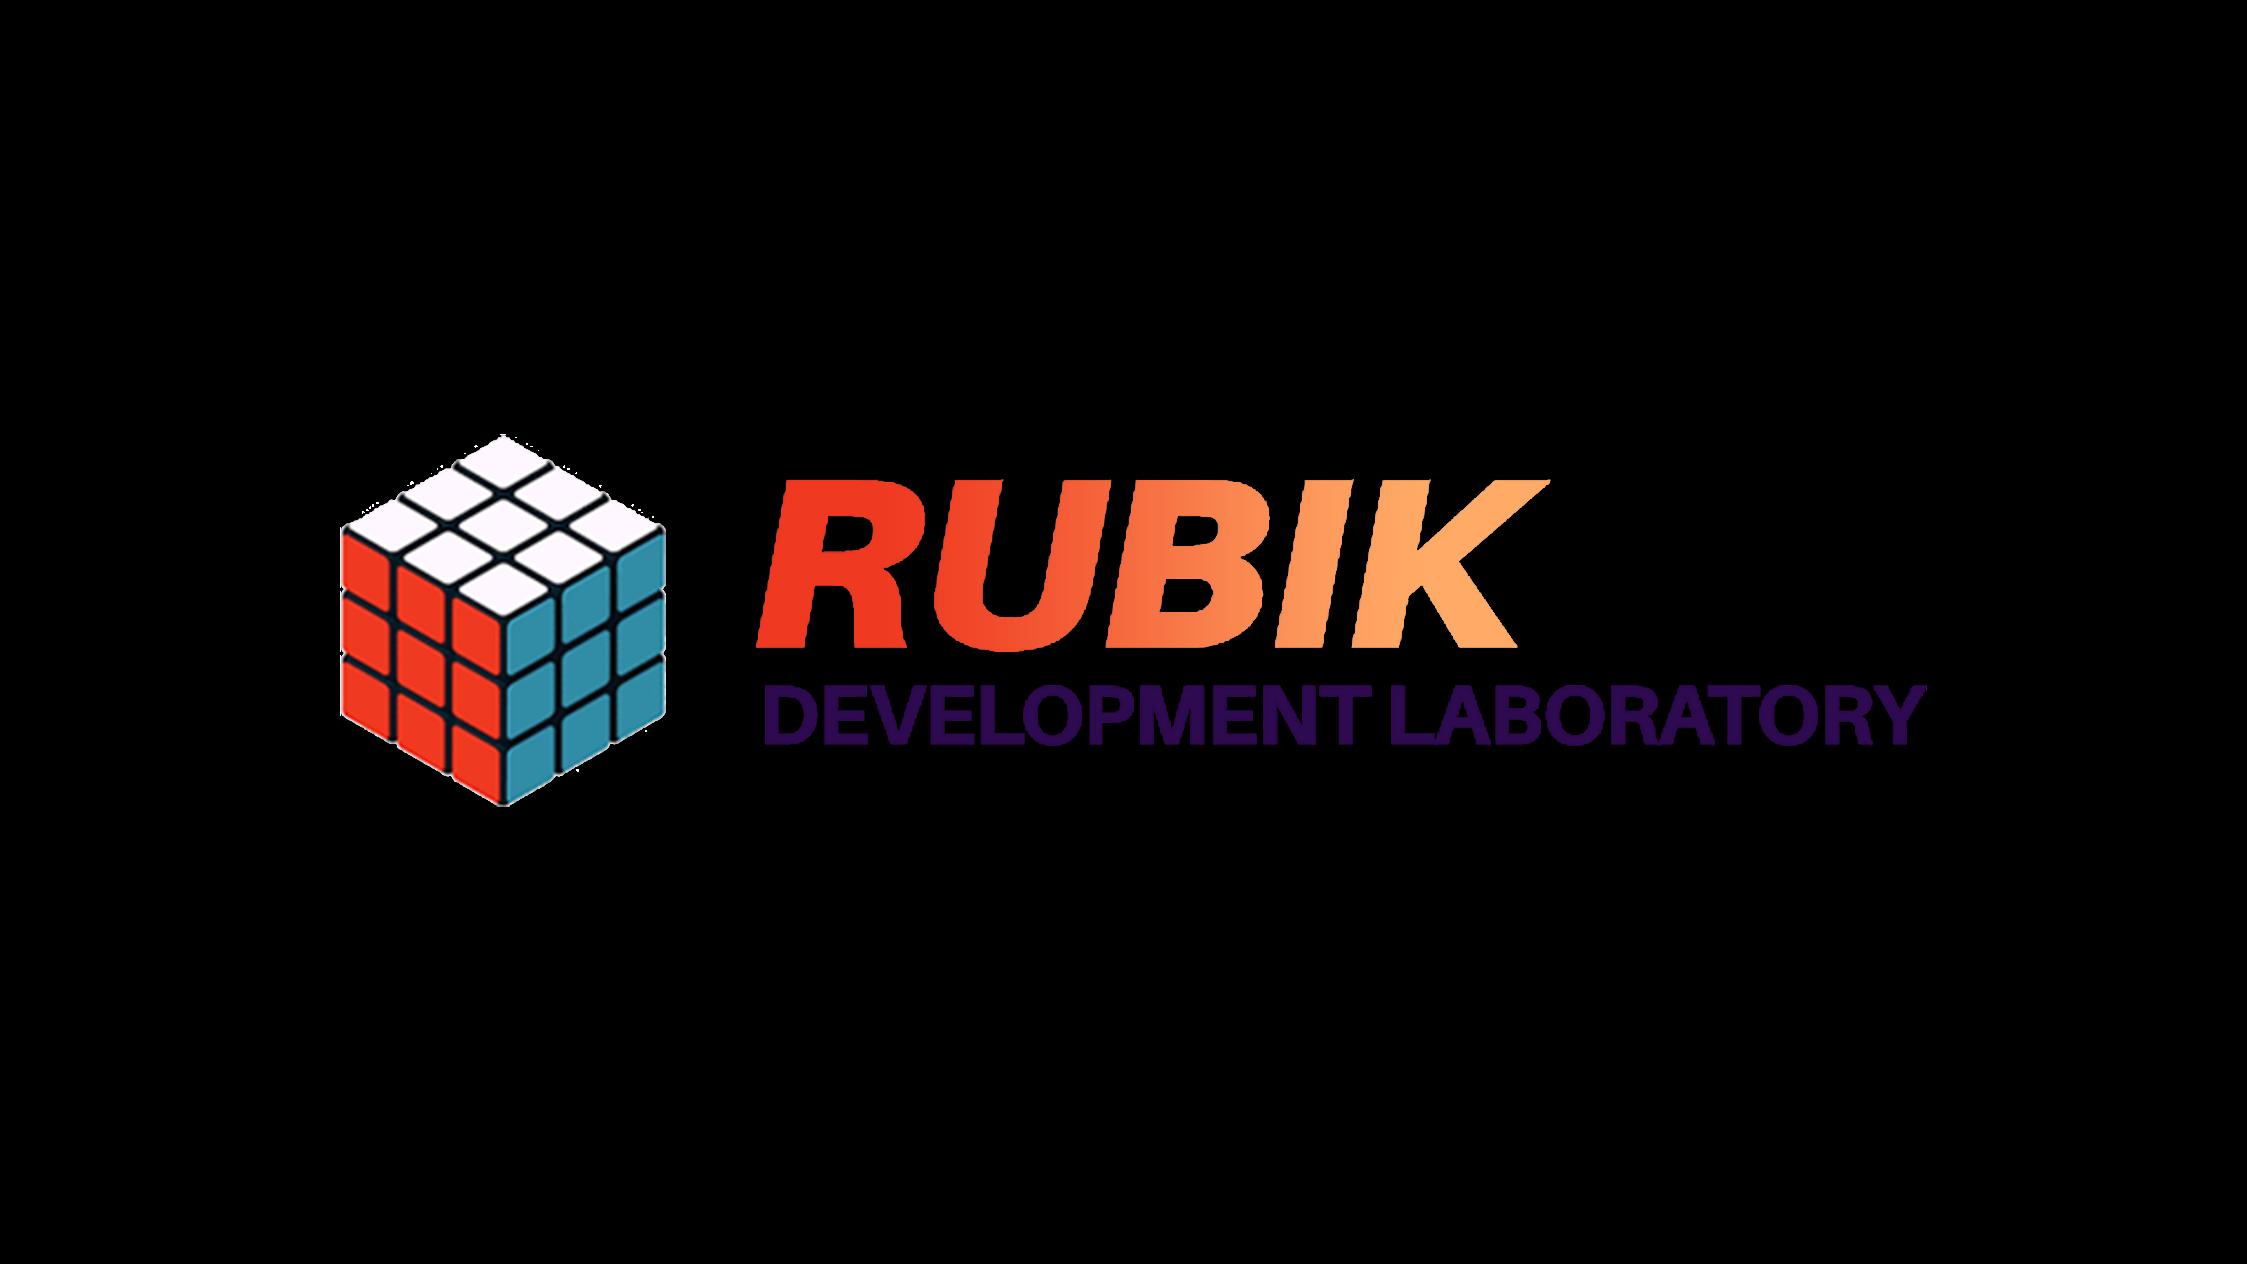 Rubik DevLab